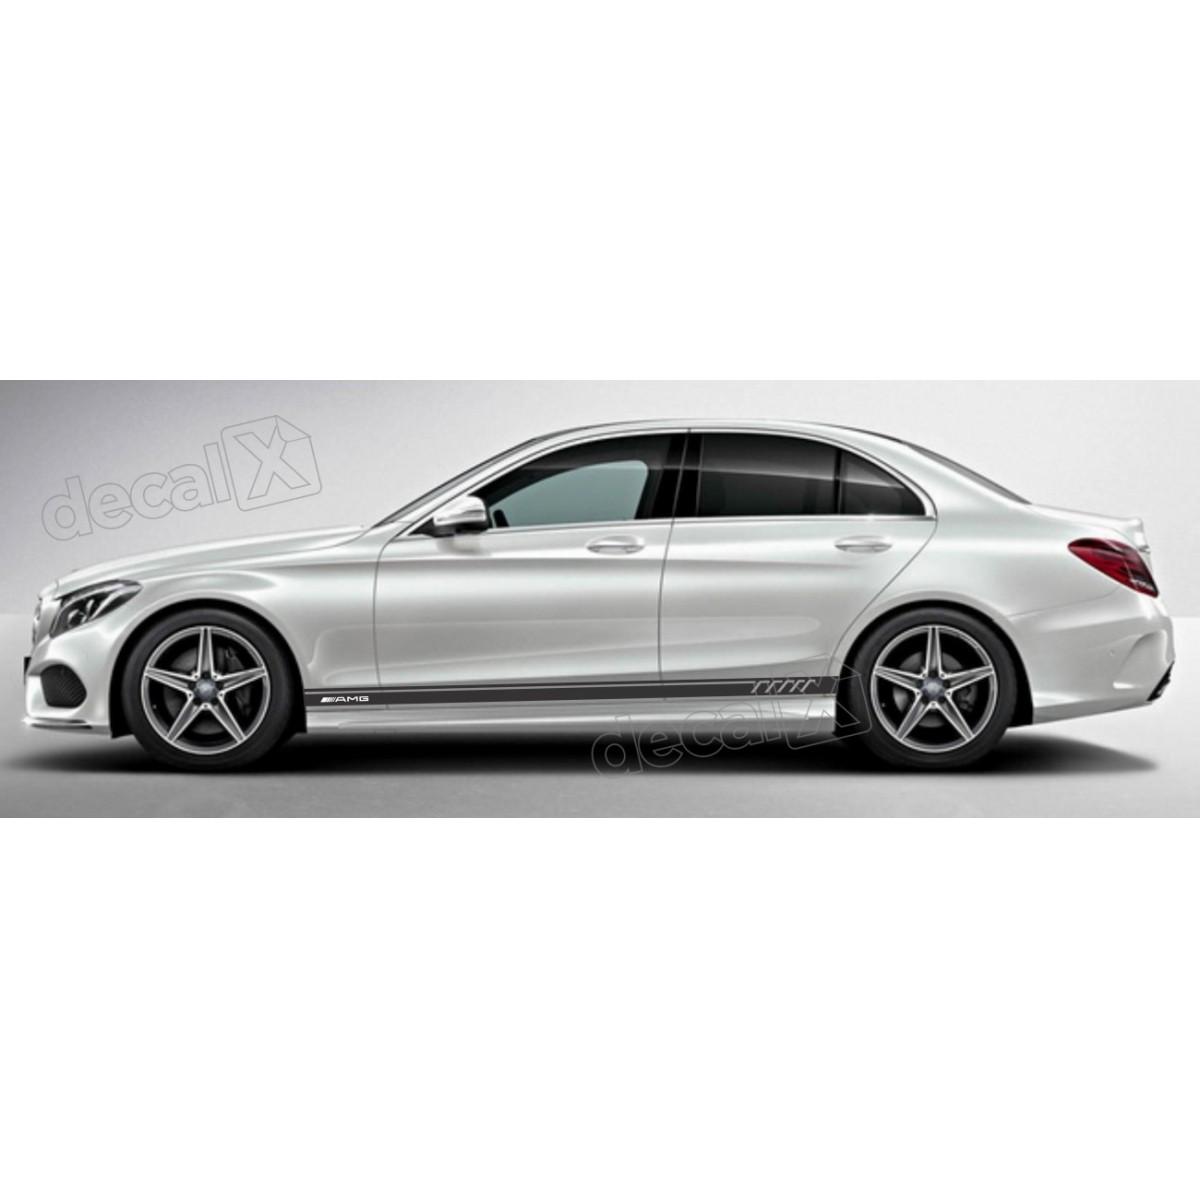 Adesivo Faixa Lateral Mercedes 3m A24